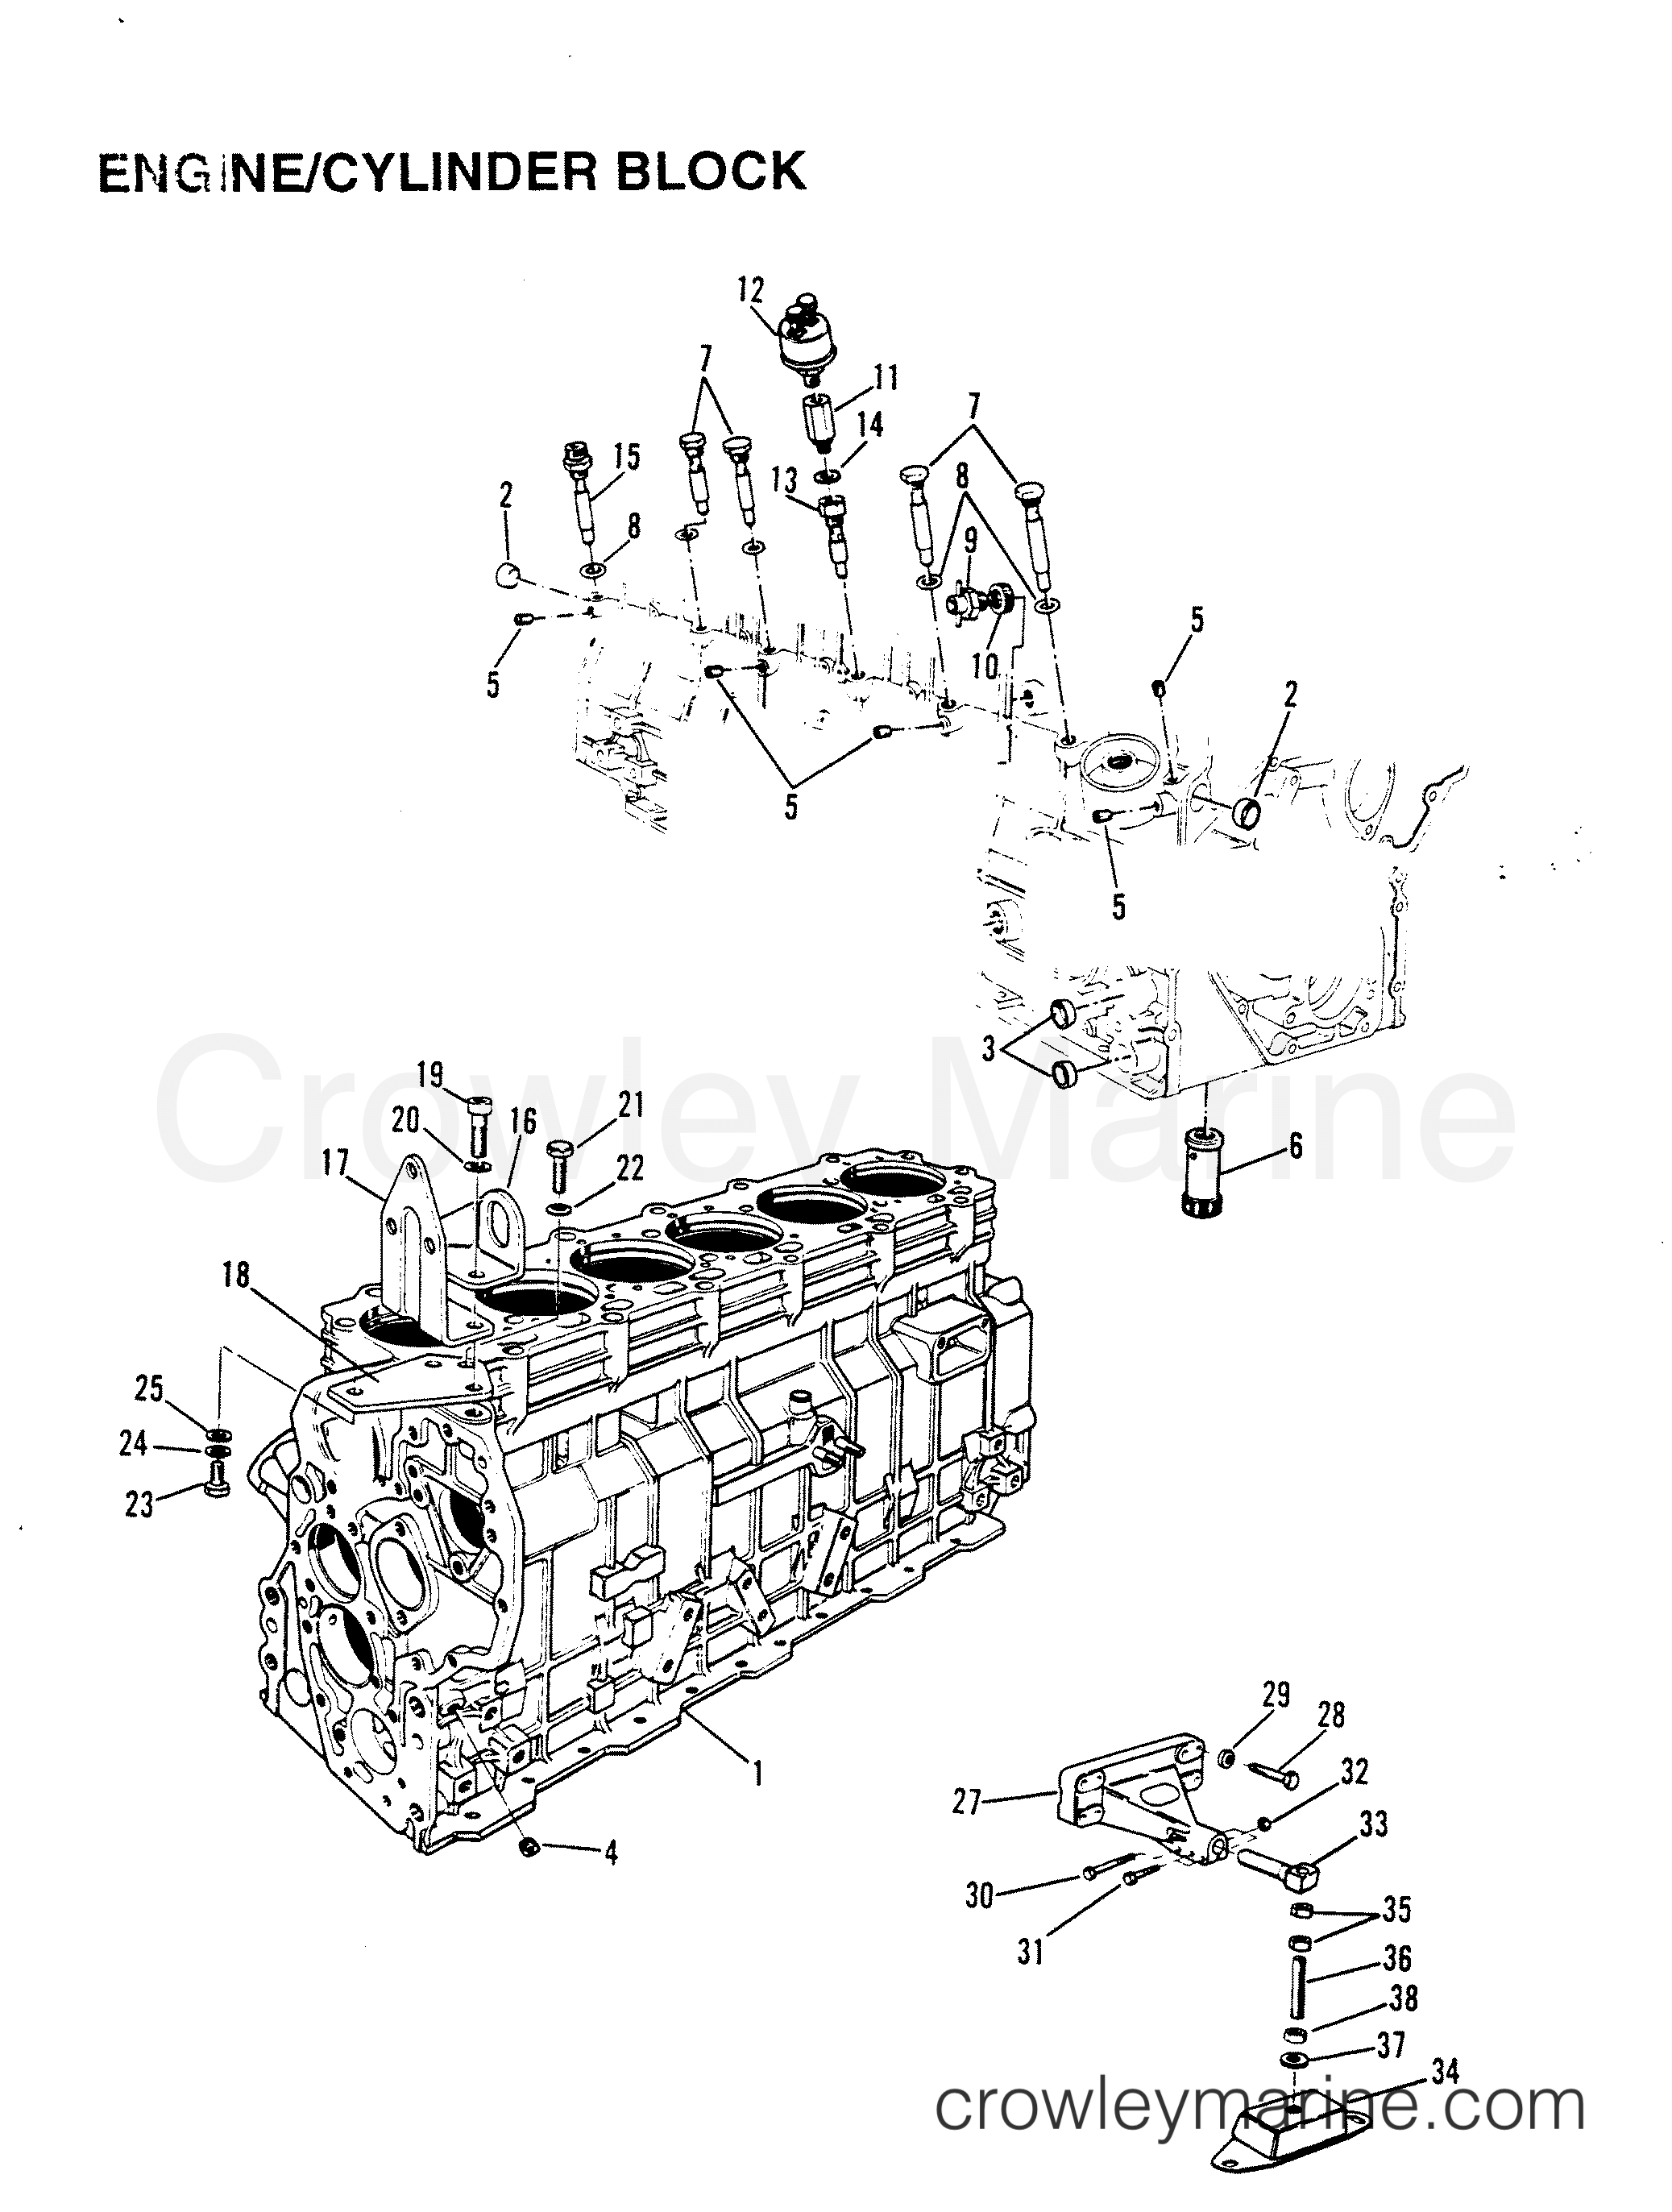 1991 Mercury Inboard Engine 642D - 34232C5DD ENGINE/CYLINDER BLOCK section